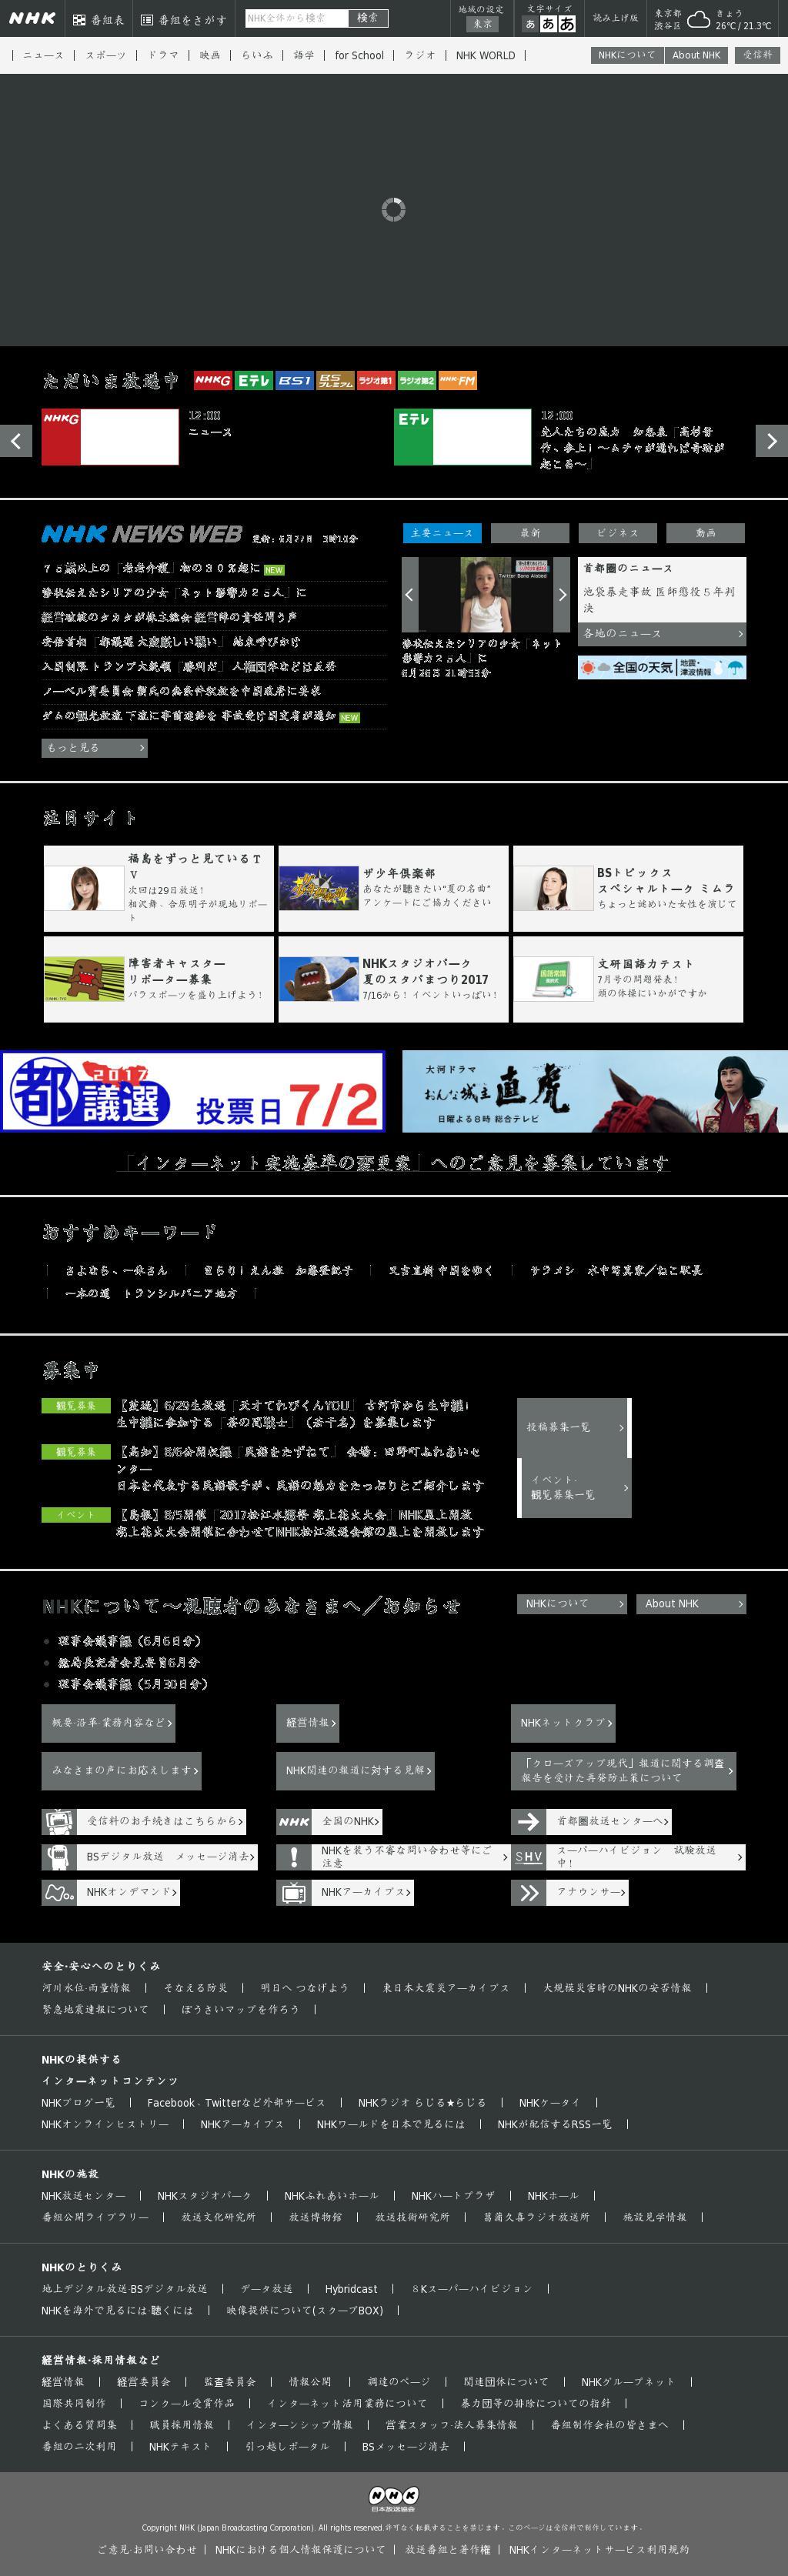 NHK Online at Tuesday June 27, 2017, 3:16 a.m. UTC